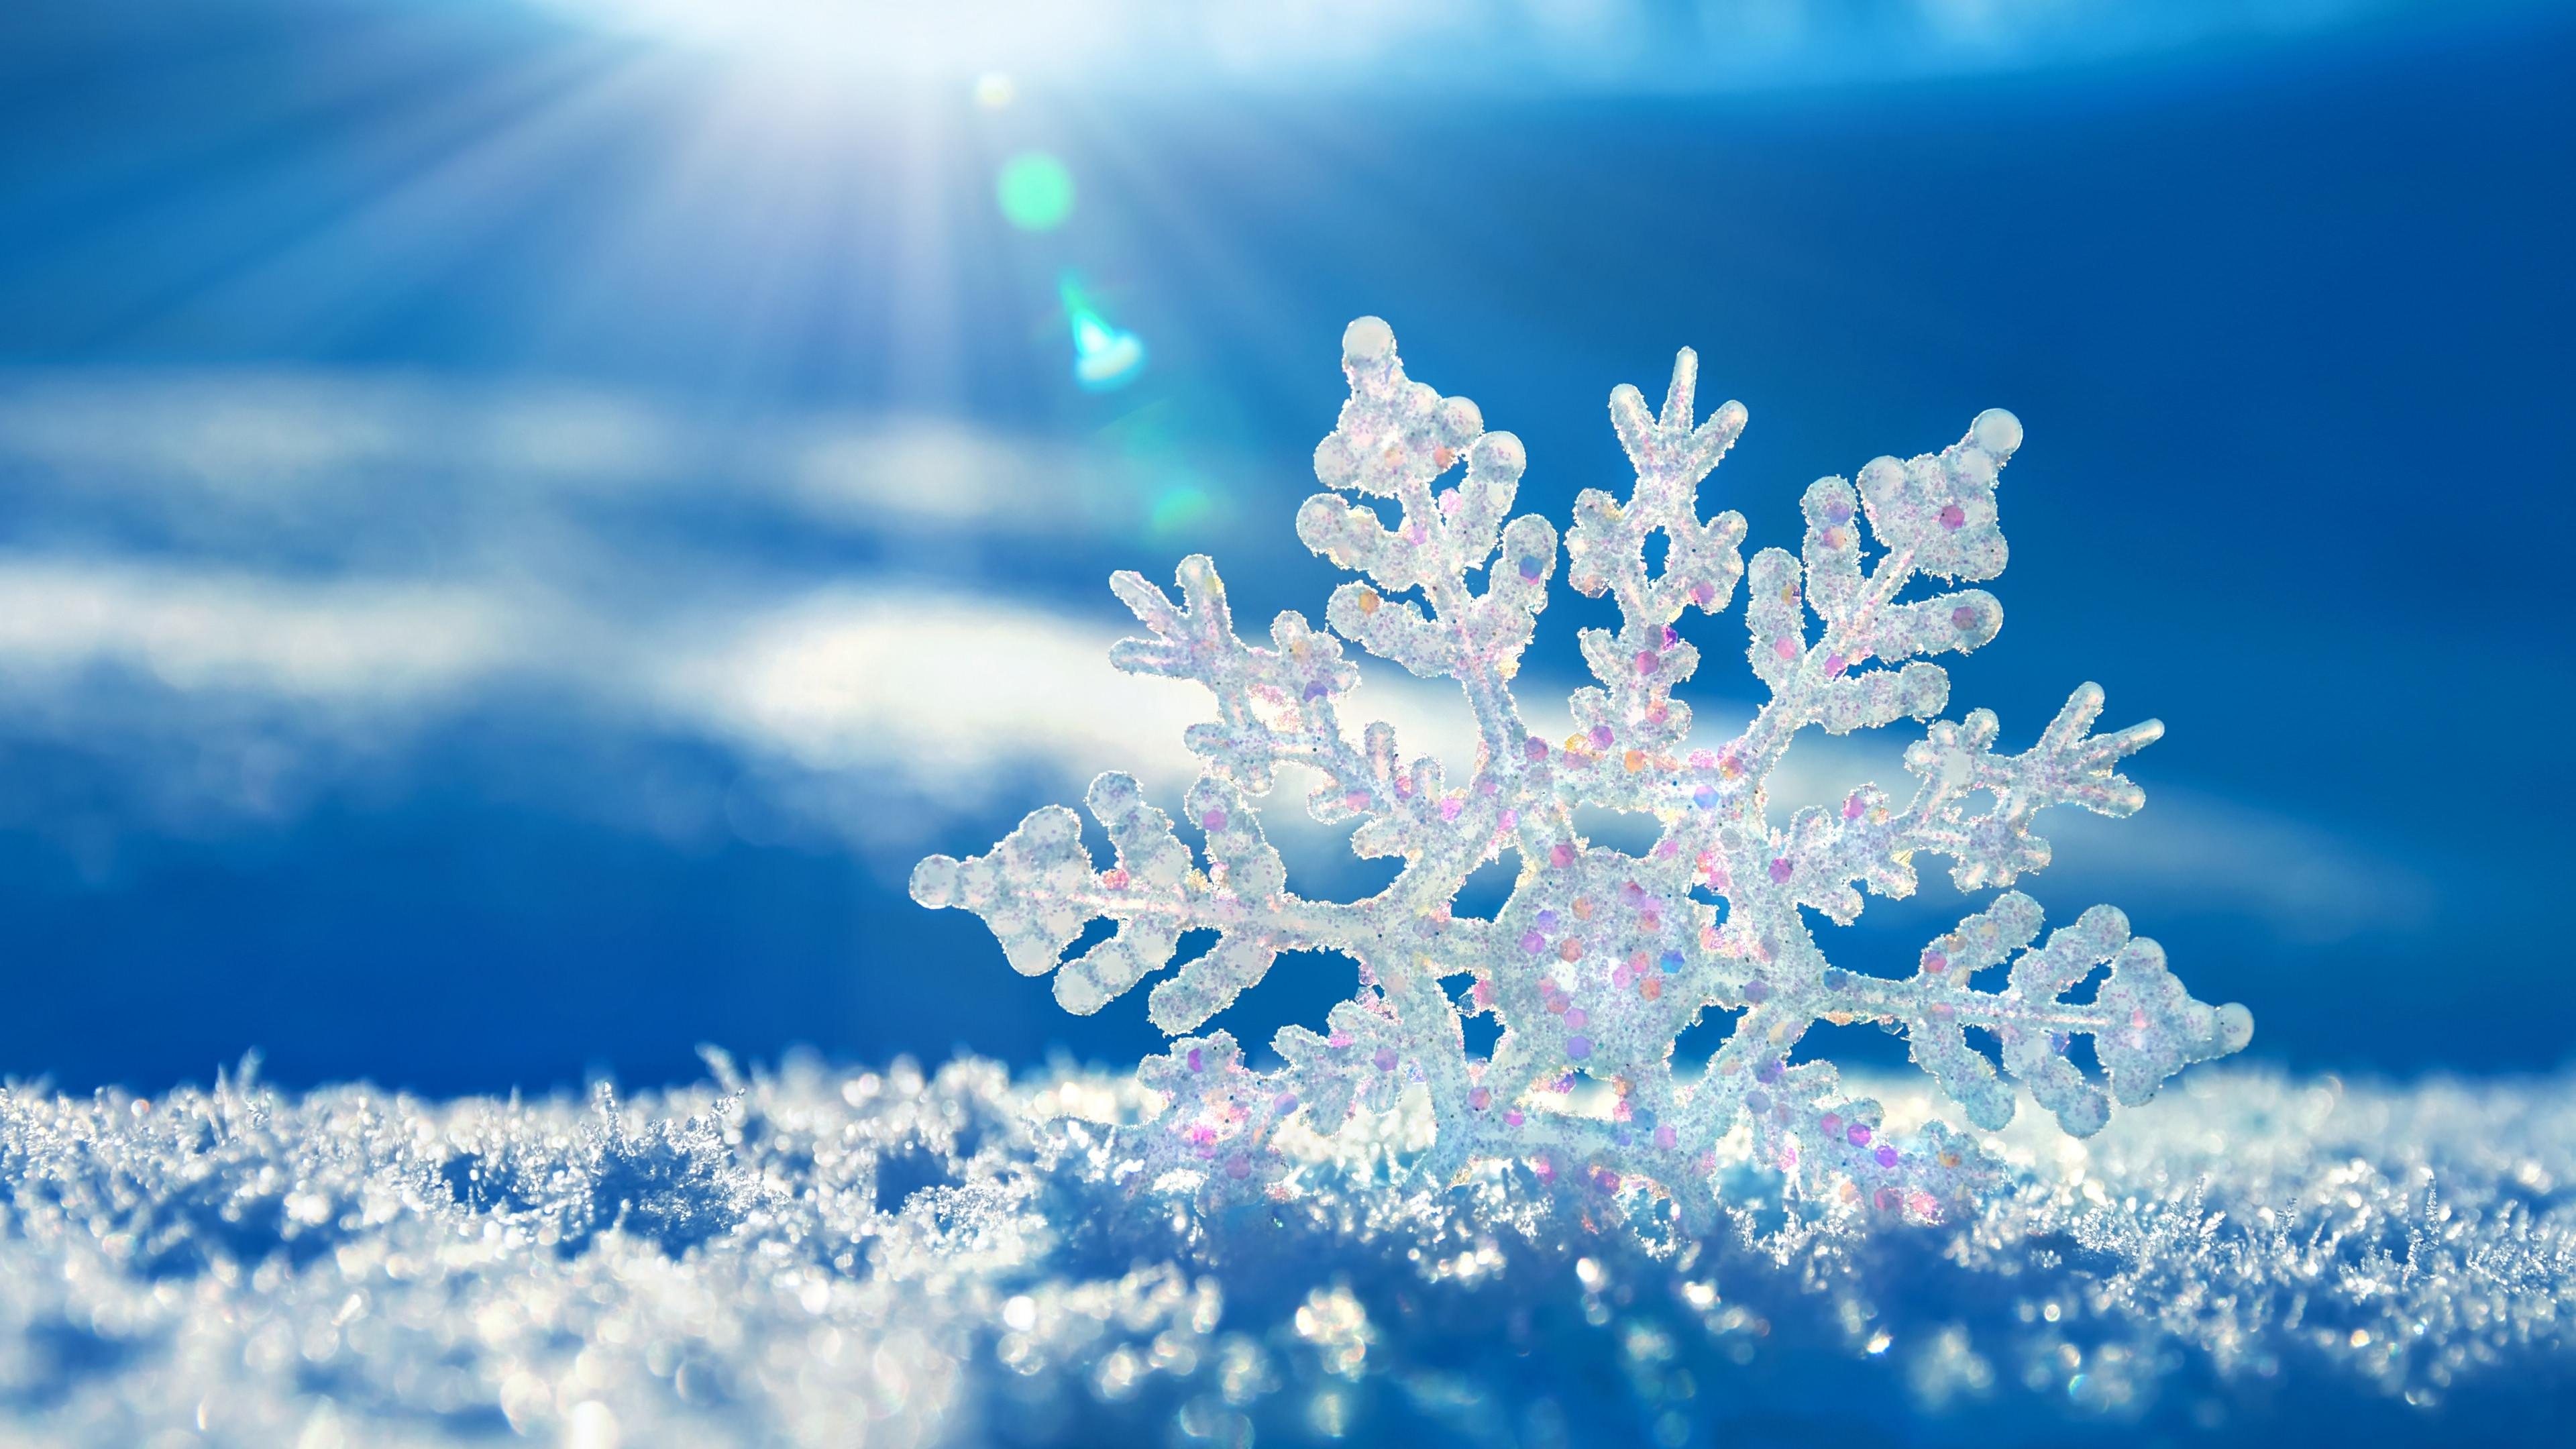 Snowflakes Image Wallpaper